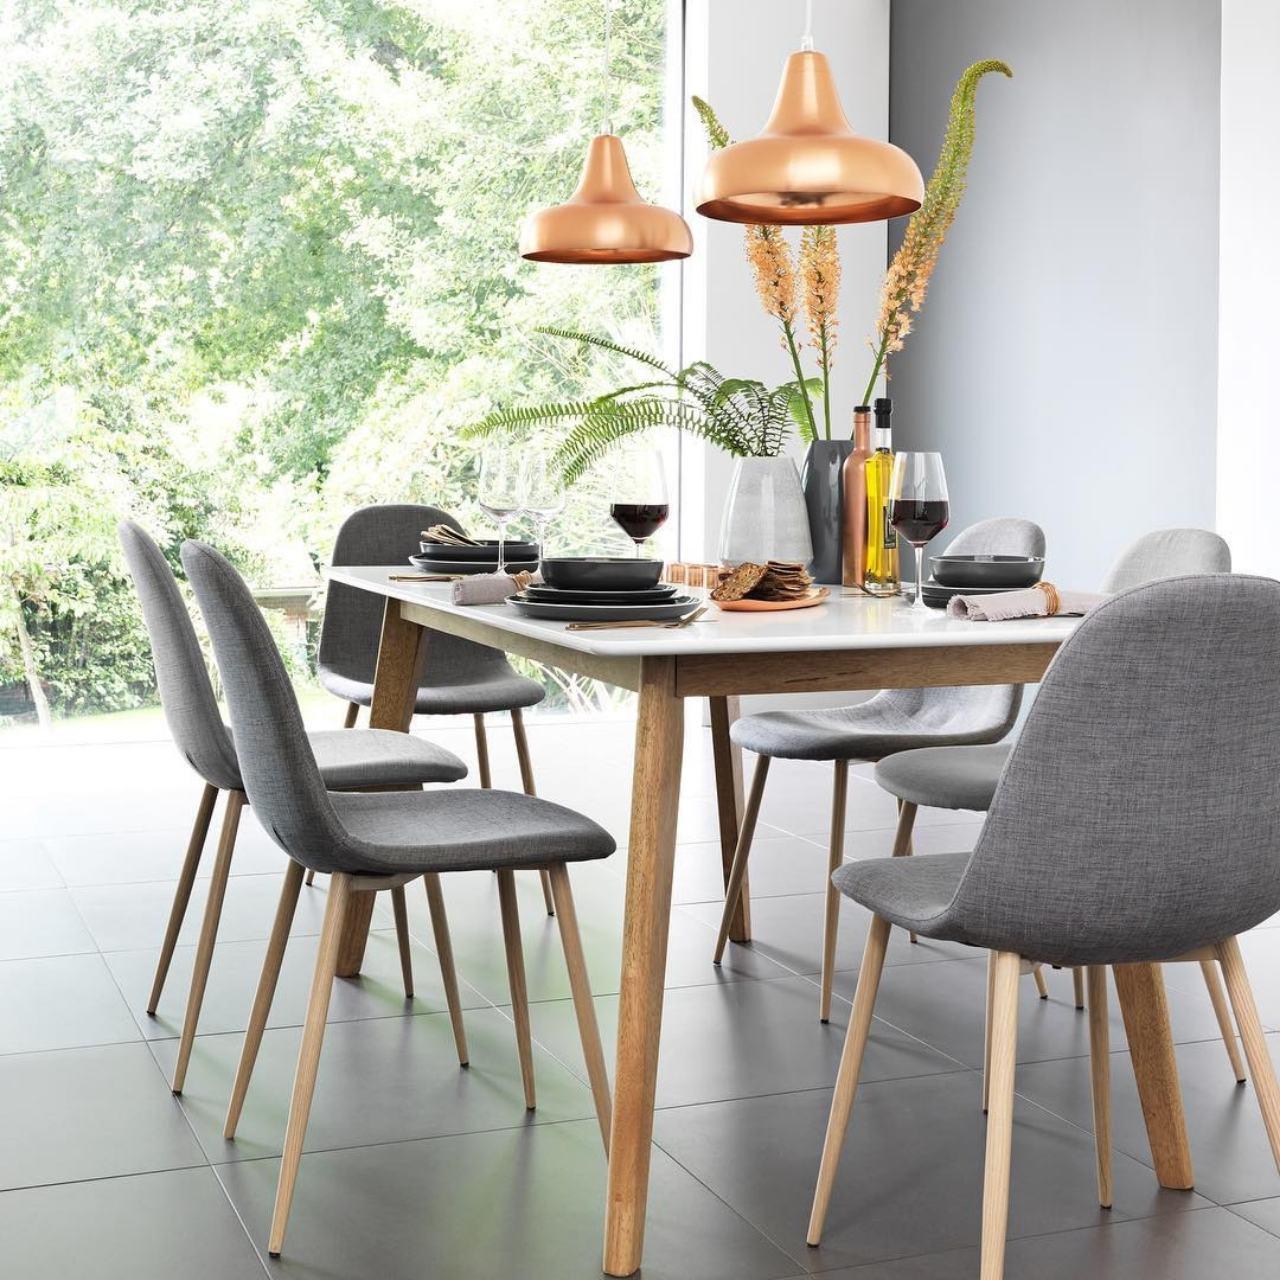 Furniture Source Philippines Nordic Dining Set 160 Cm